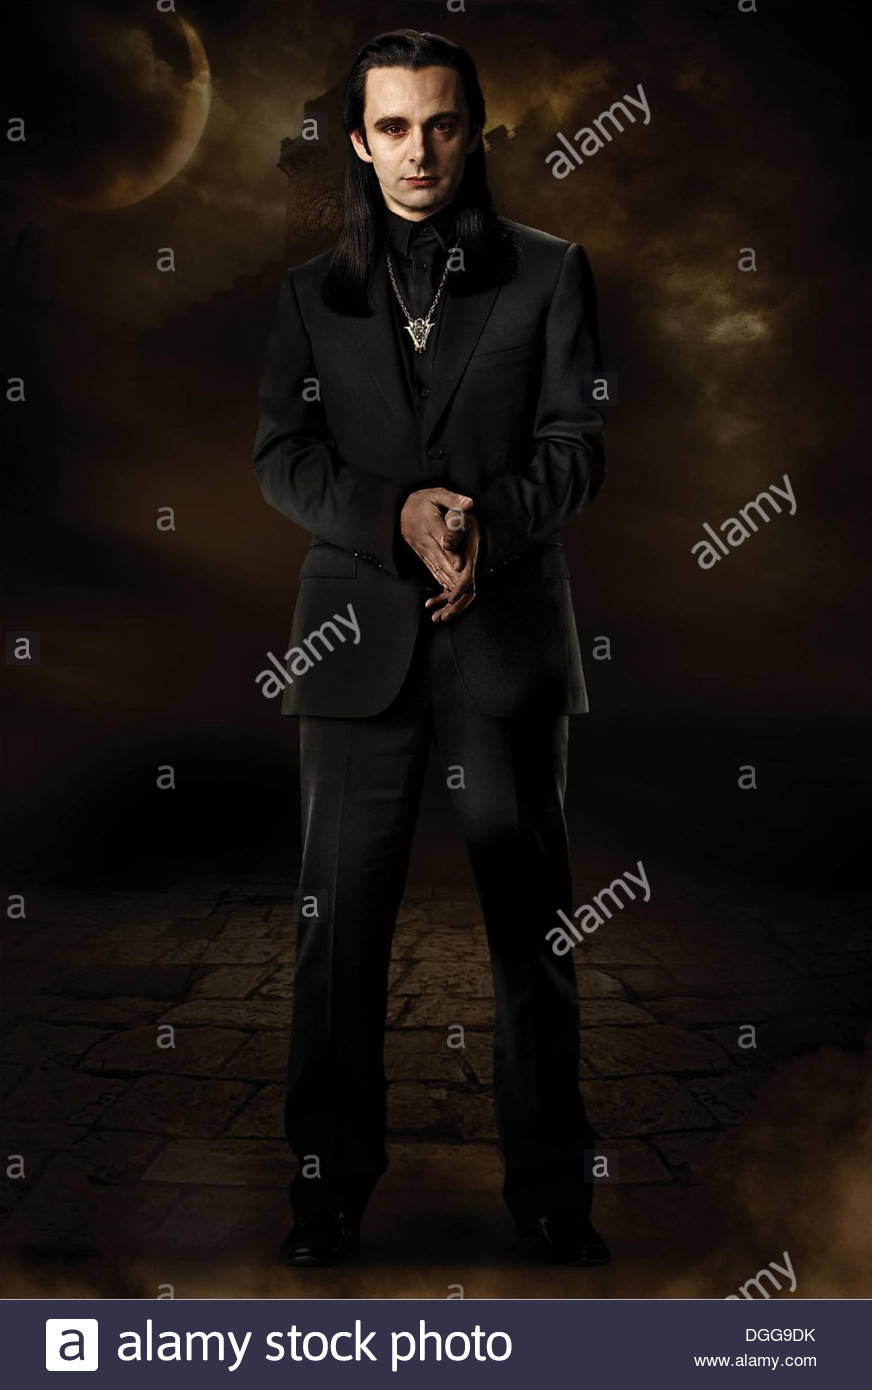 THE TWILIGHT SAGA: NEW MOON 2009) MICHAEL SHEEN CHRIS WEITZ DIR) 009 MOVIESTORE COLLECTION LTD - Stock Image